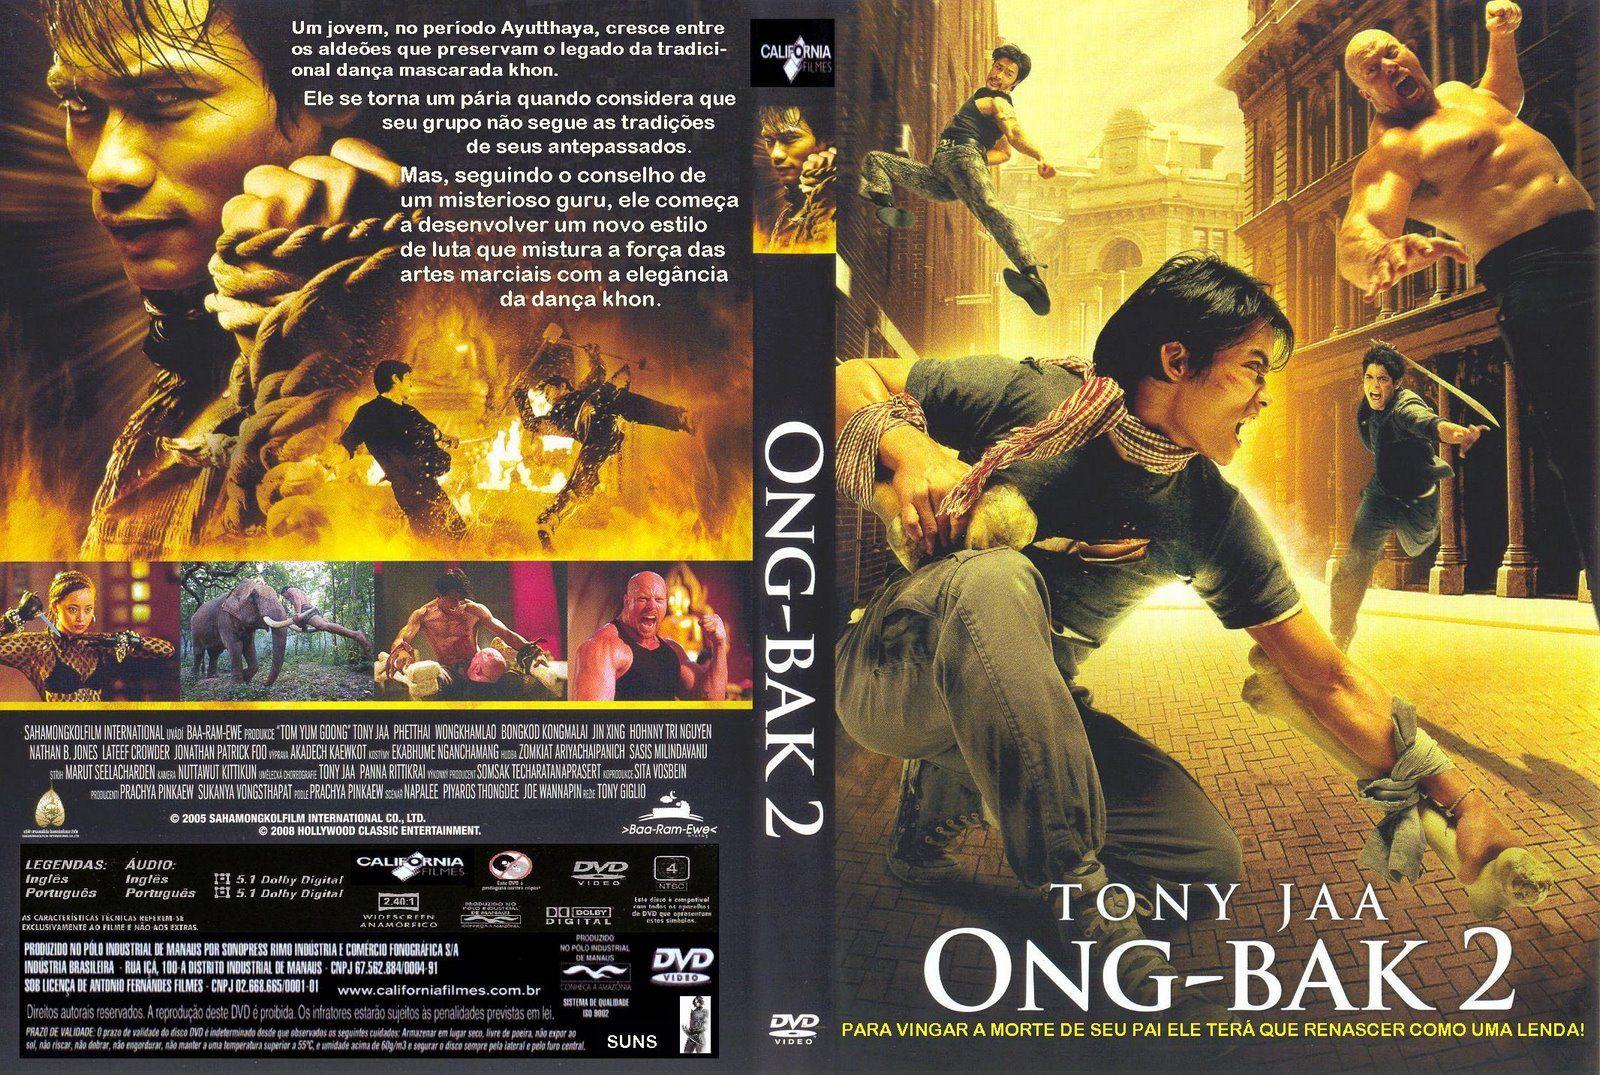 Ong Bak 2 Comeco 2008 Dvdp Filmes Colecao Filmes E